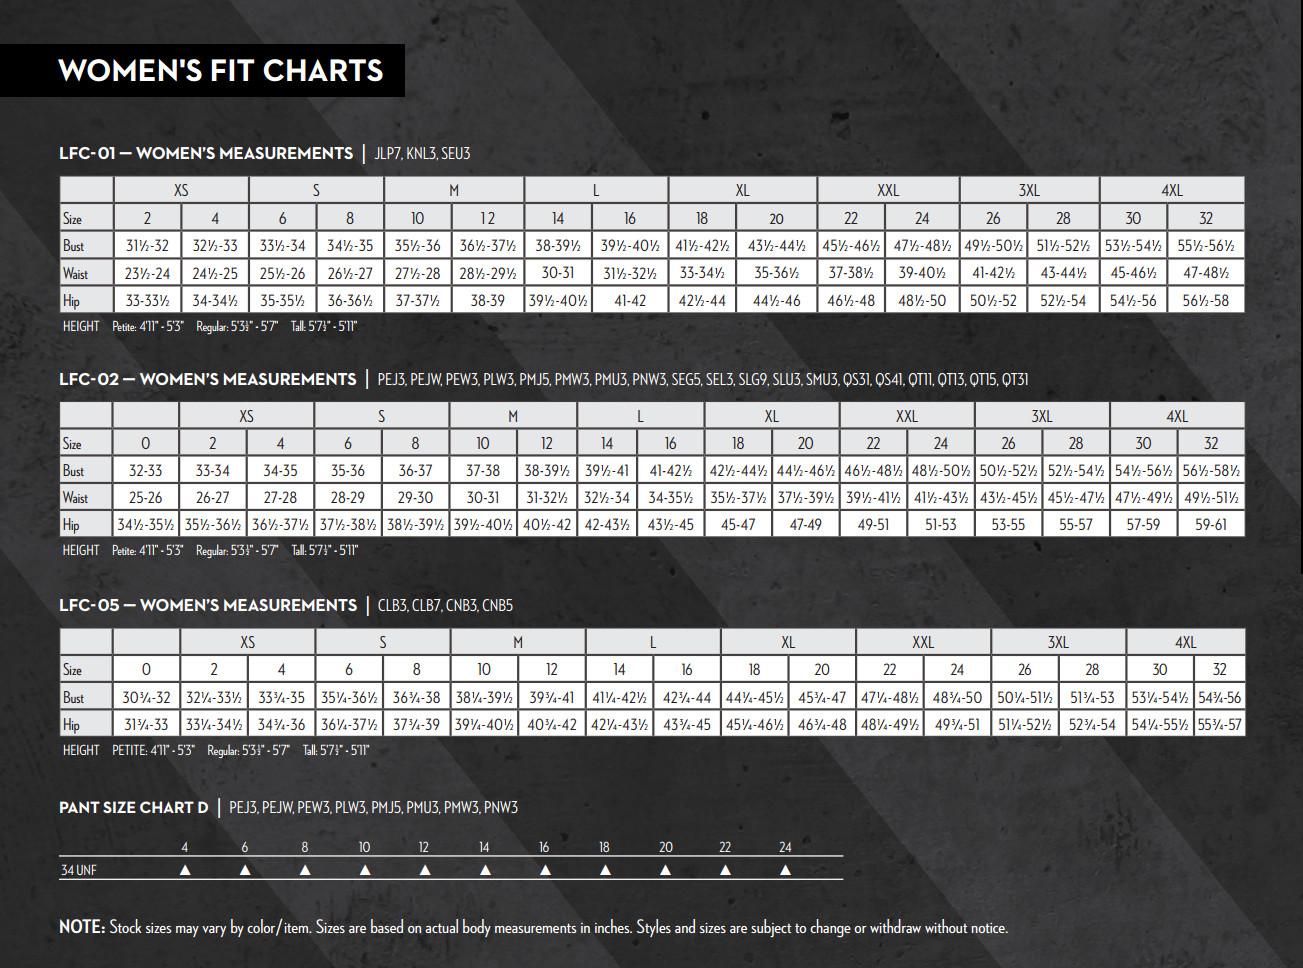 women's frc size chart